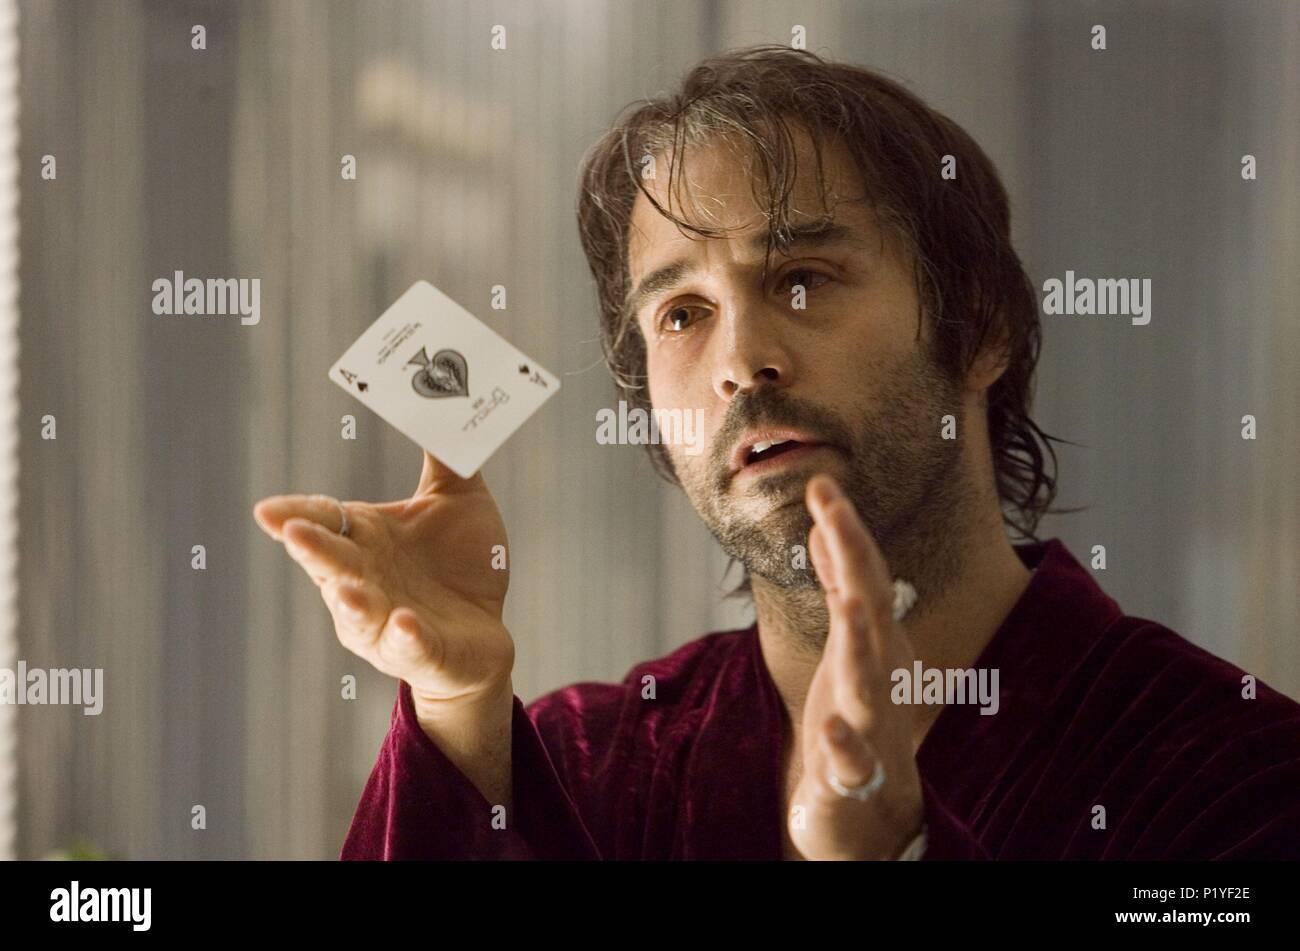 Original Film Title: SMOKIN' ACES.  English Title: SMOKIN' ACES.  Film Director: JOE CARNAHAN.  Year: 2007.  Stars: JEREMY PIVEN. Credit: WORKING TITLE FILMS/RELATIVITY MEDIA/SCION FILMS LIMITED/ / TRUEBLOOD, JAMIE / Album - Stock Image